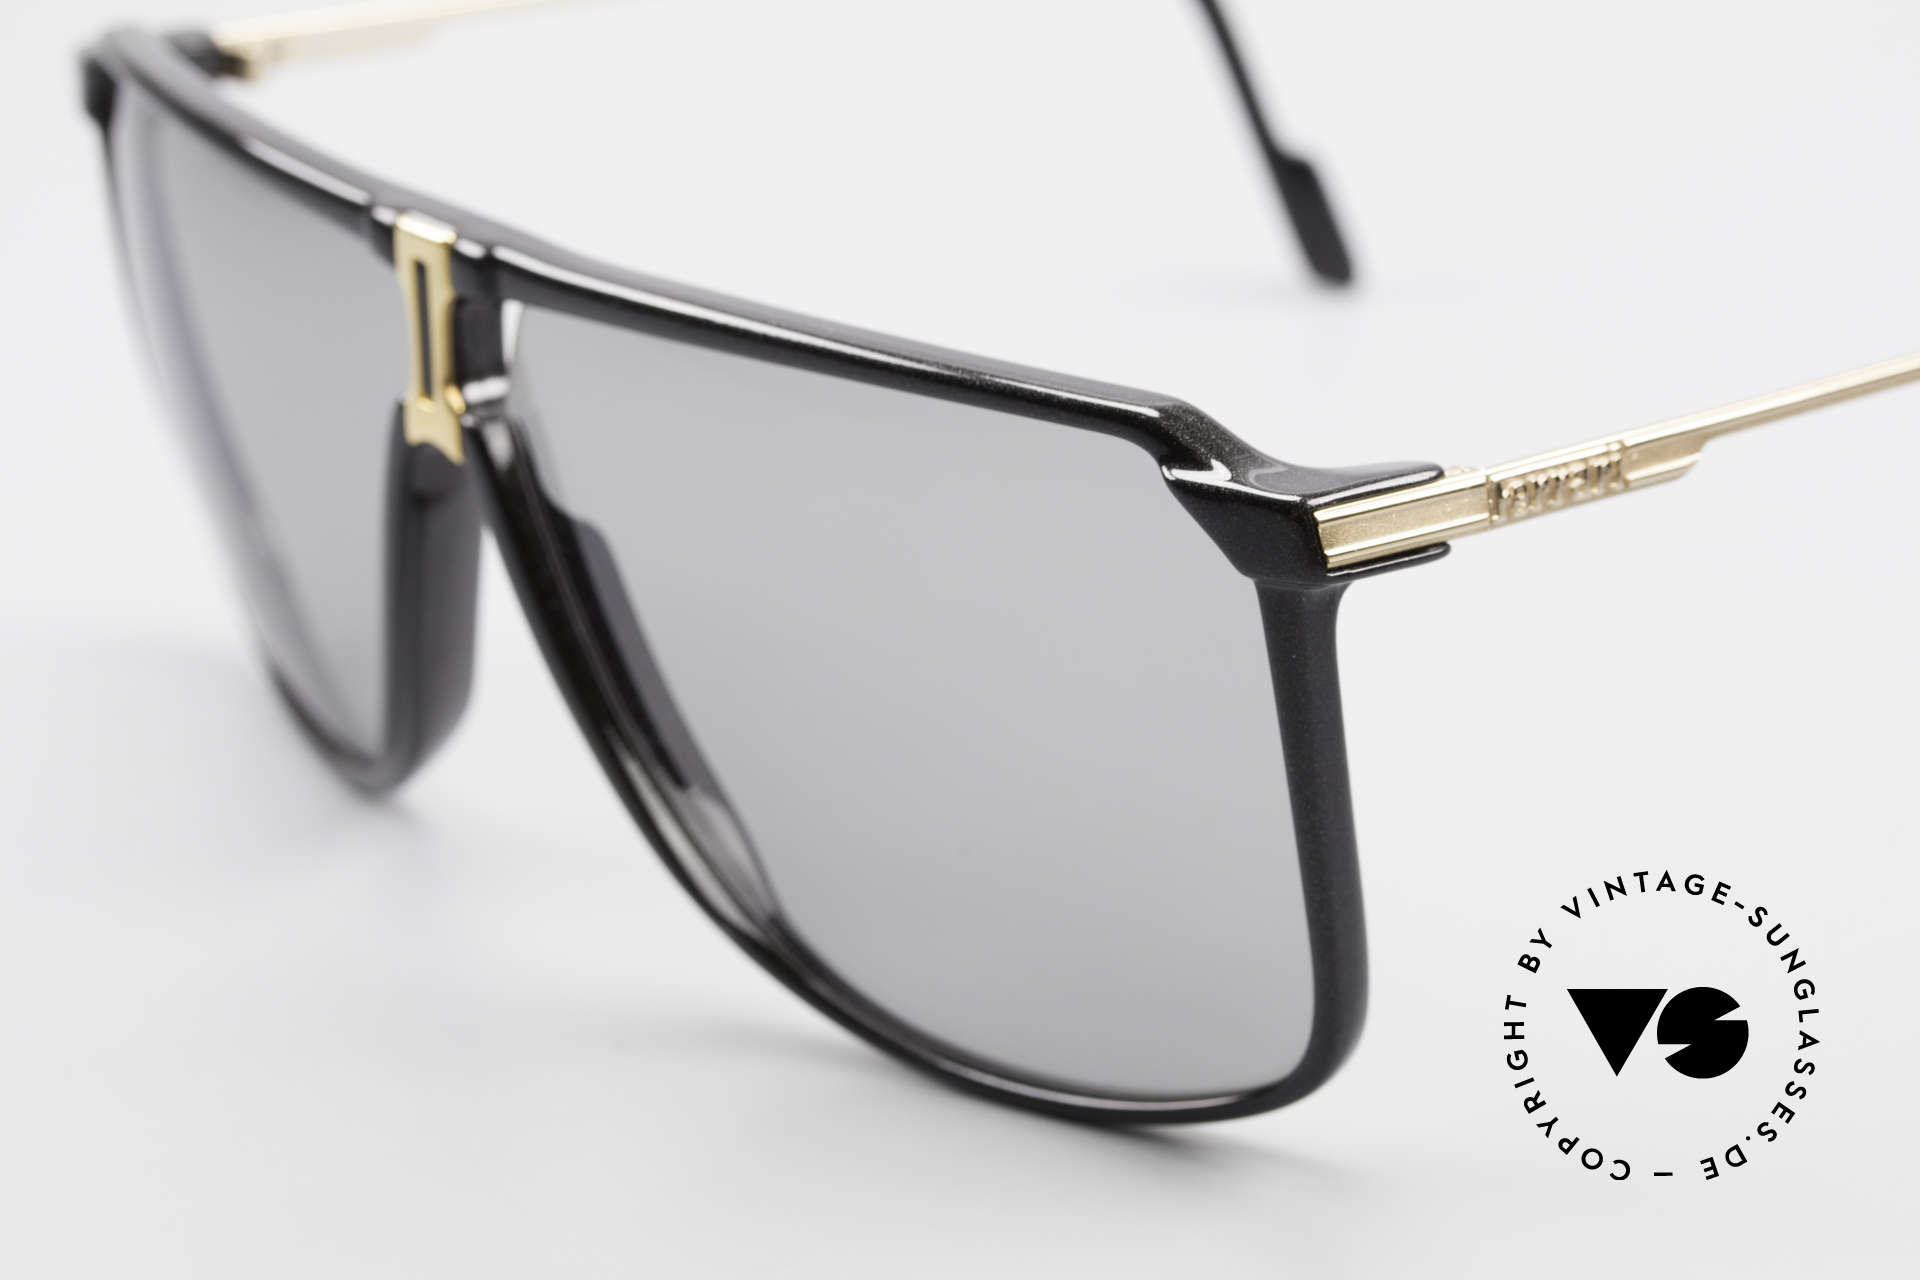 Ferrari F37/S Carbonio Sunglasses 90's XL, rare vintage shades of the FERRARI FORMULA series, Made for Men